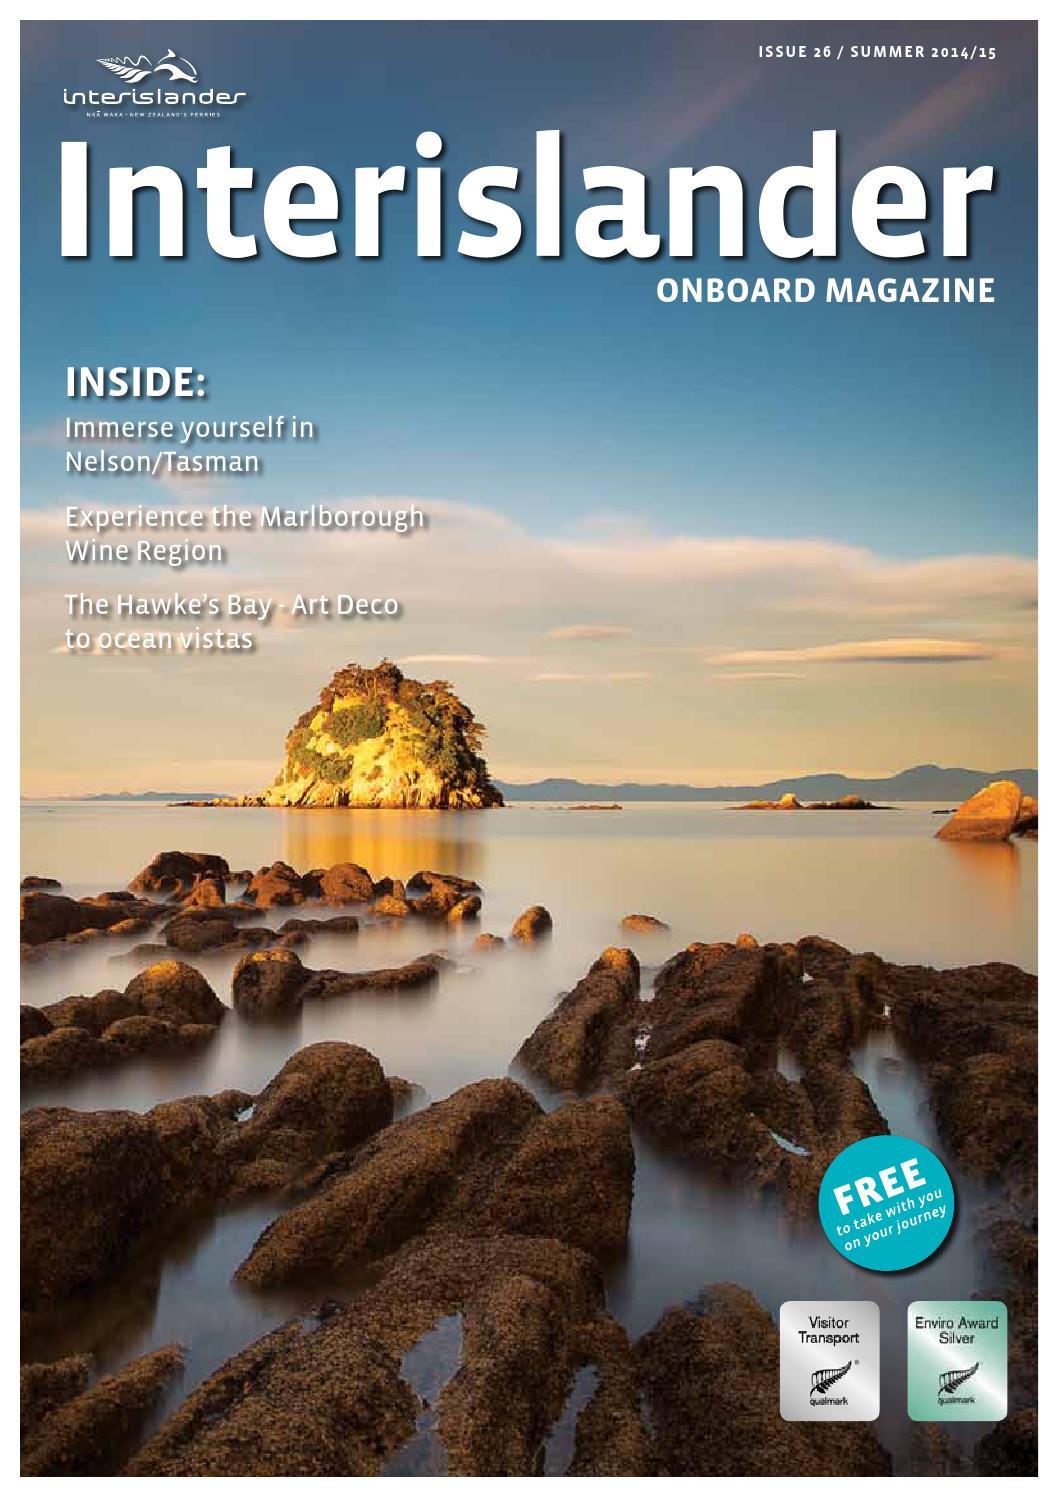 Interislander Magazine Issue 26 Summer 2014 15 By Inflightpublishing Issuu